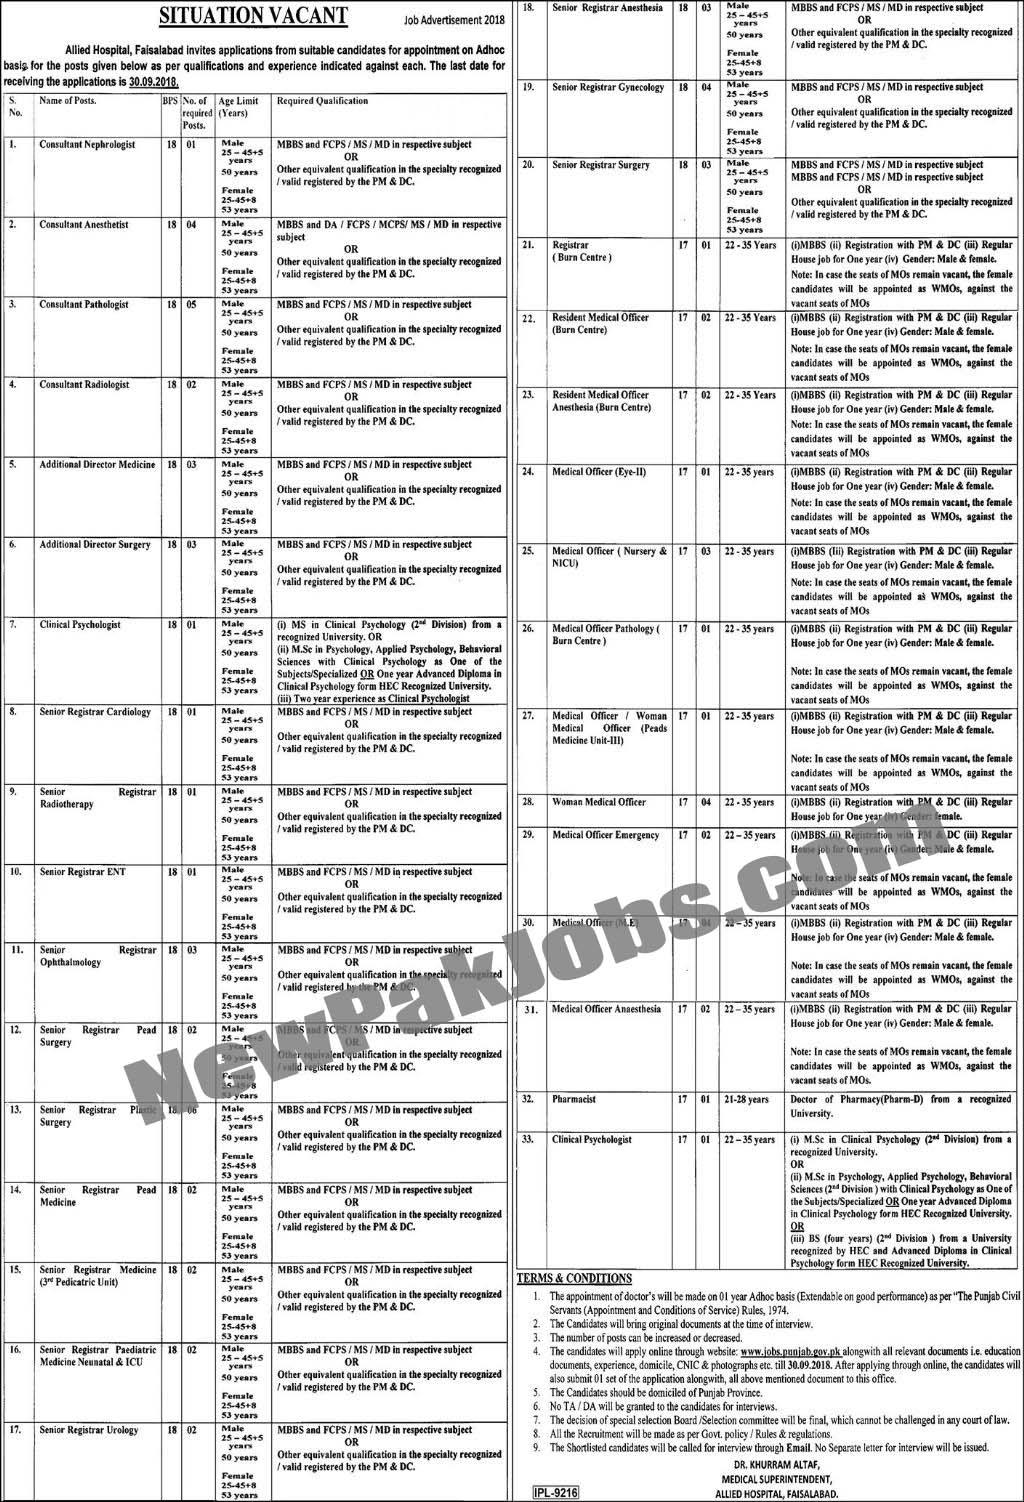 76 New Govt Jobs in Allied Hospital (September 2018) Faisalabad